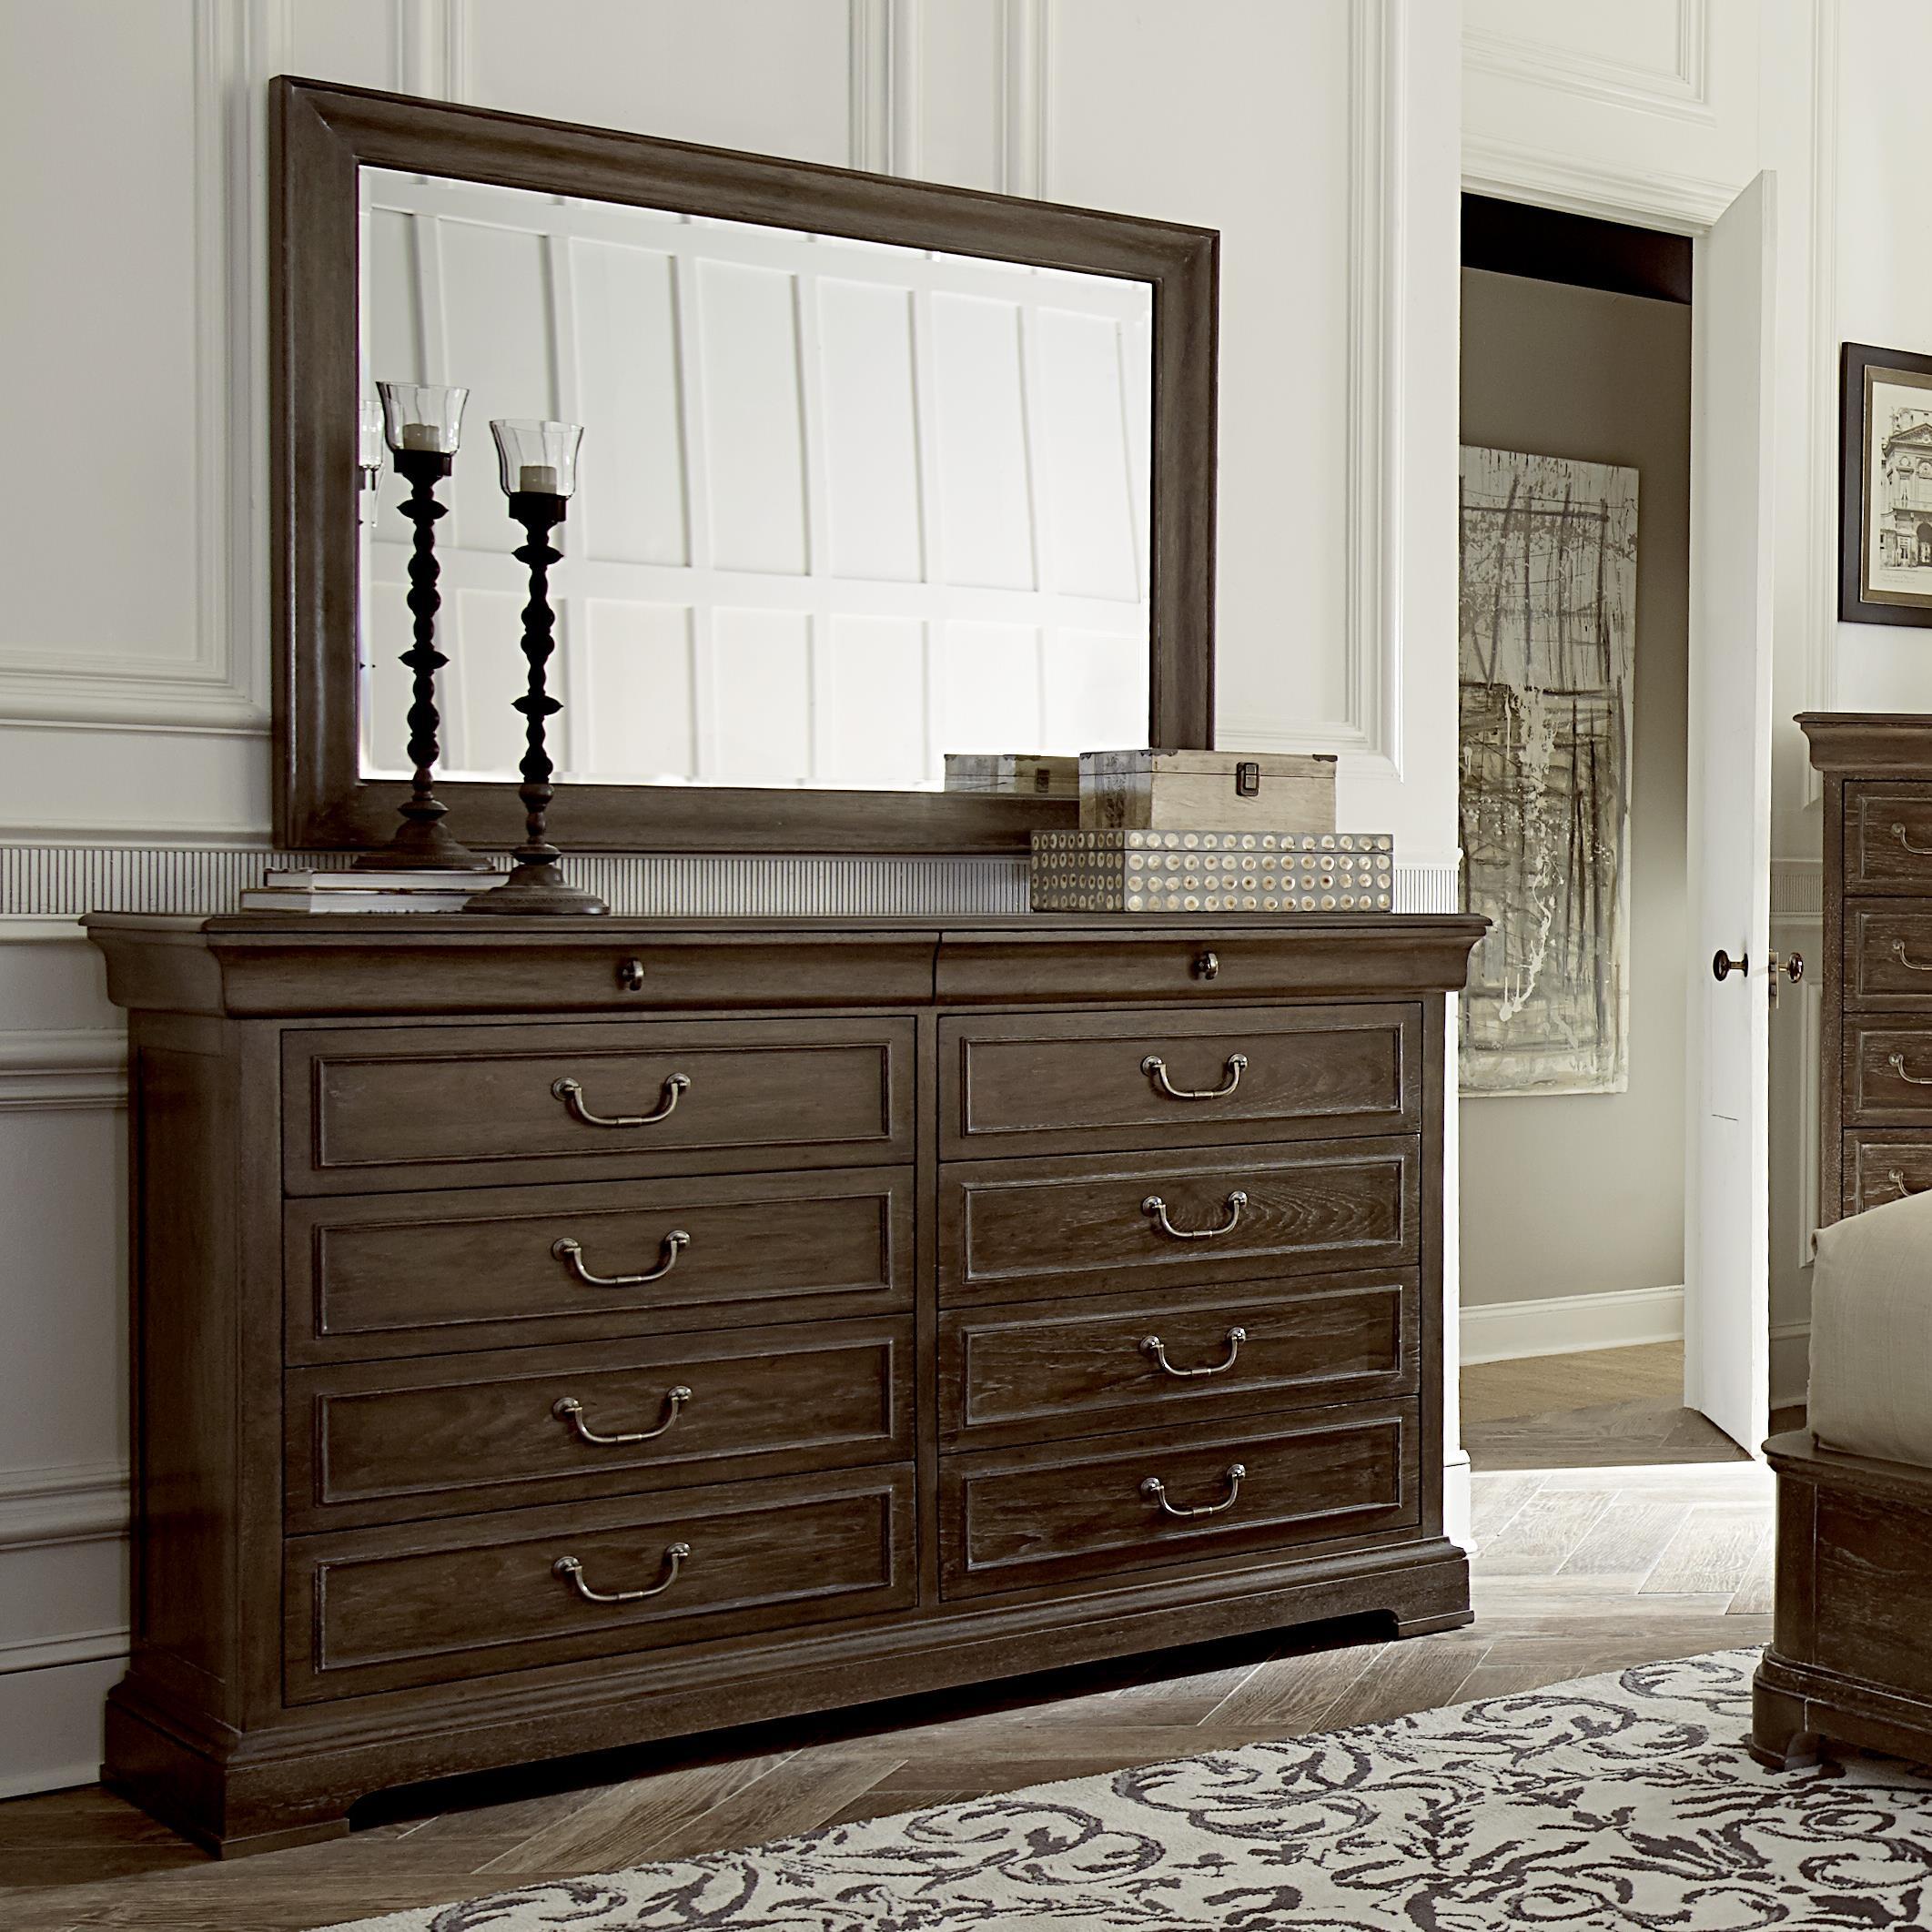 A R T Furniture Inc Saint Germain Dresser Amp Mirror